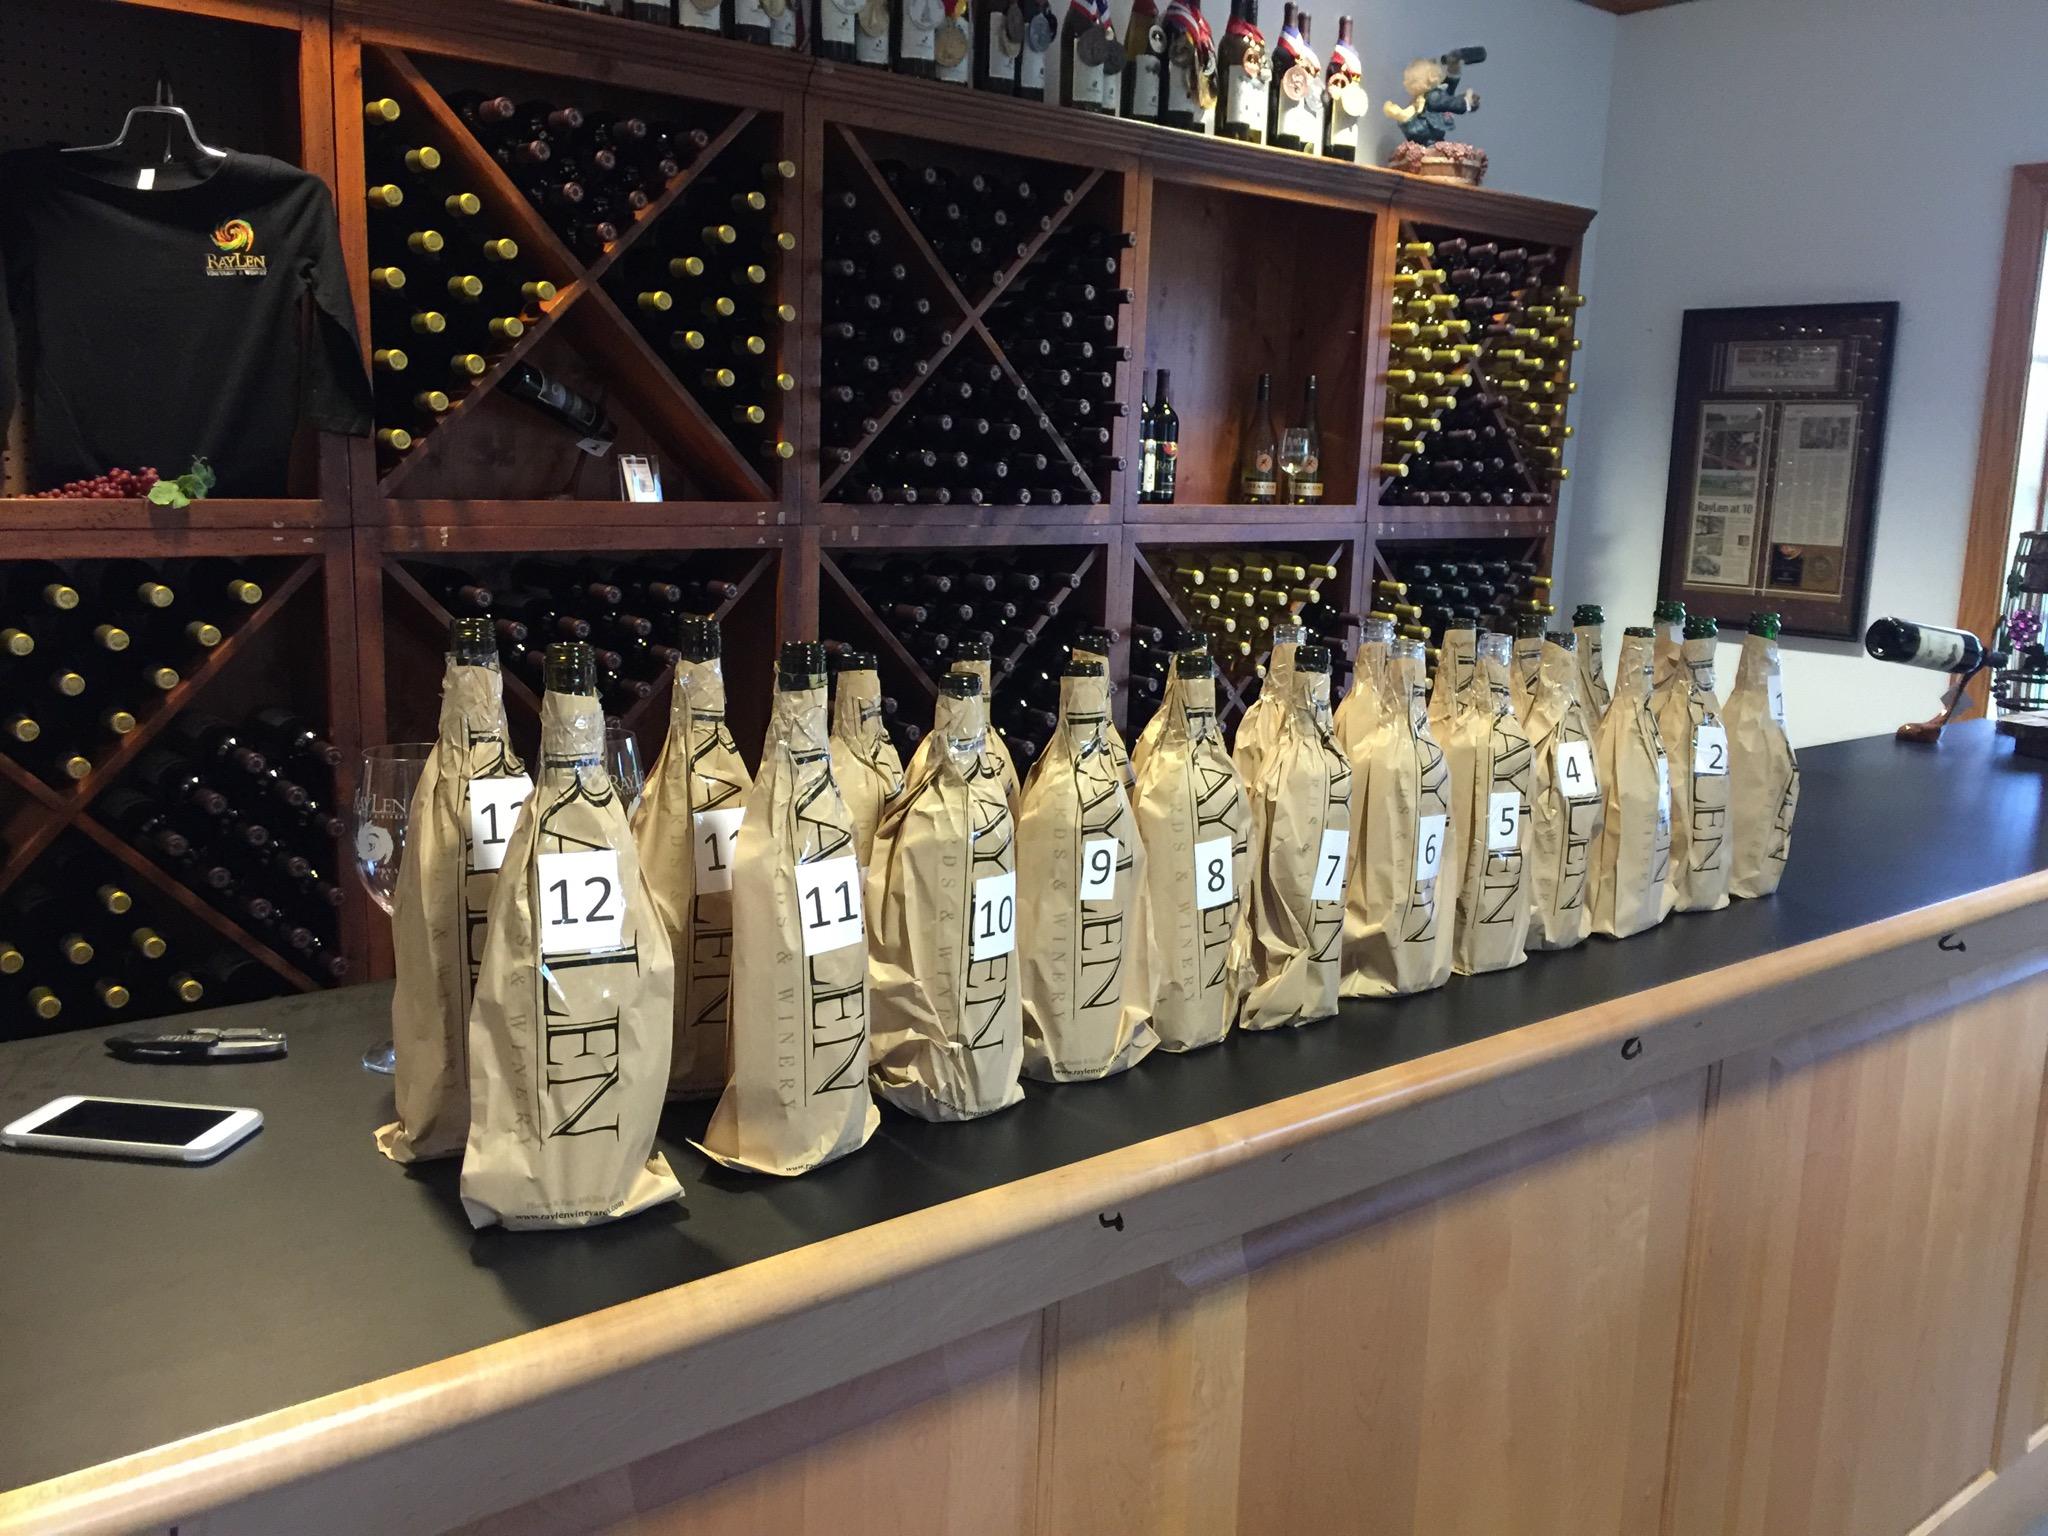 North Carolina Wine vs the World — a Blind Tasting at RayLen Vineyard